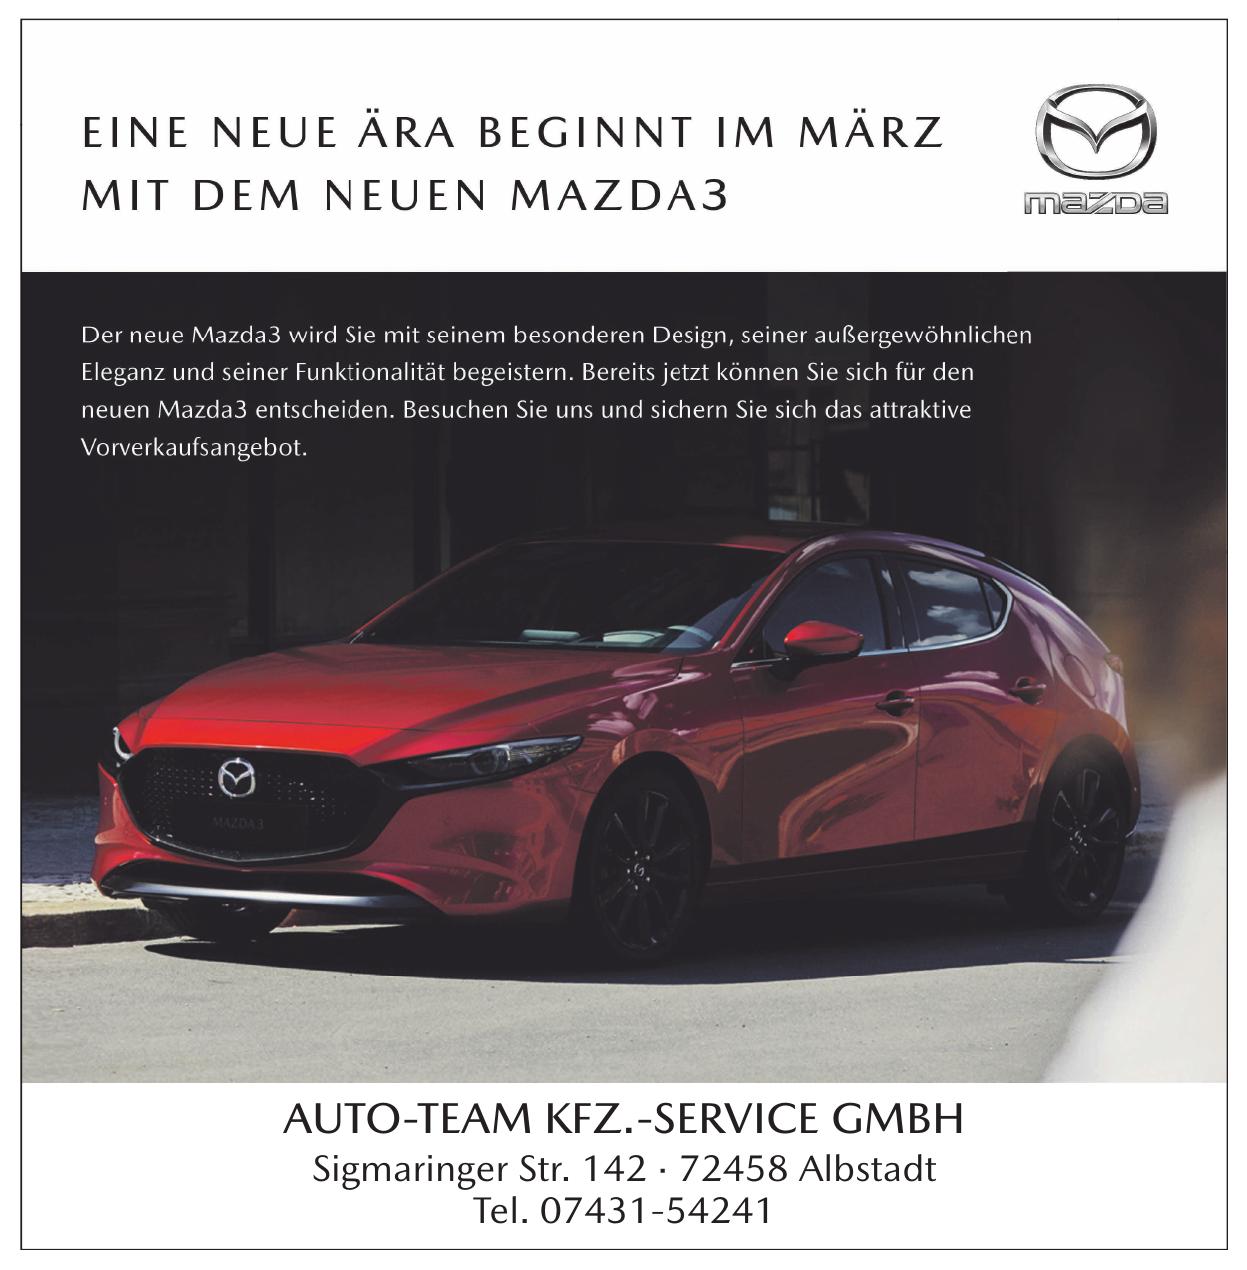 Auto-Team Kfz.-Service GmbH